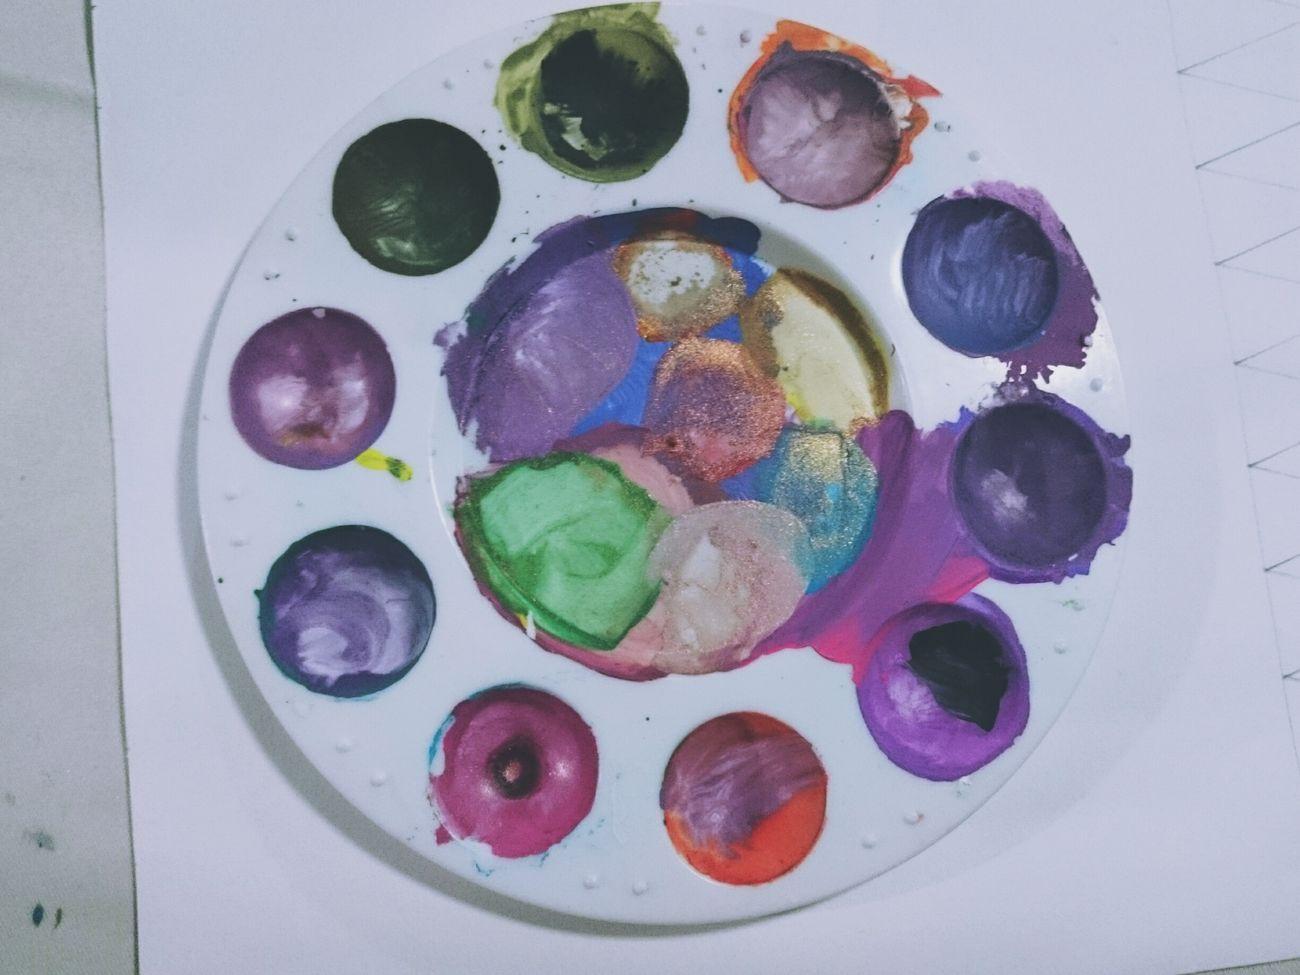 Painting Art Painting Godette Godete Pinceladas Art Art, Drawing, Creativity Art Photography Drawing Drawingart Colors Colorful Rainbow Creative Photography Xperiaphotography Creative Minds ♡♥